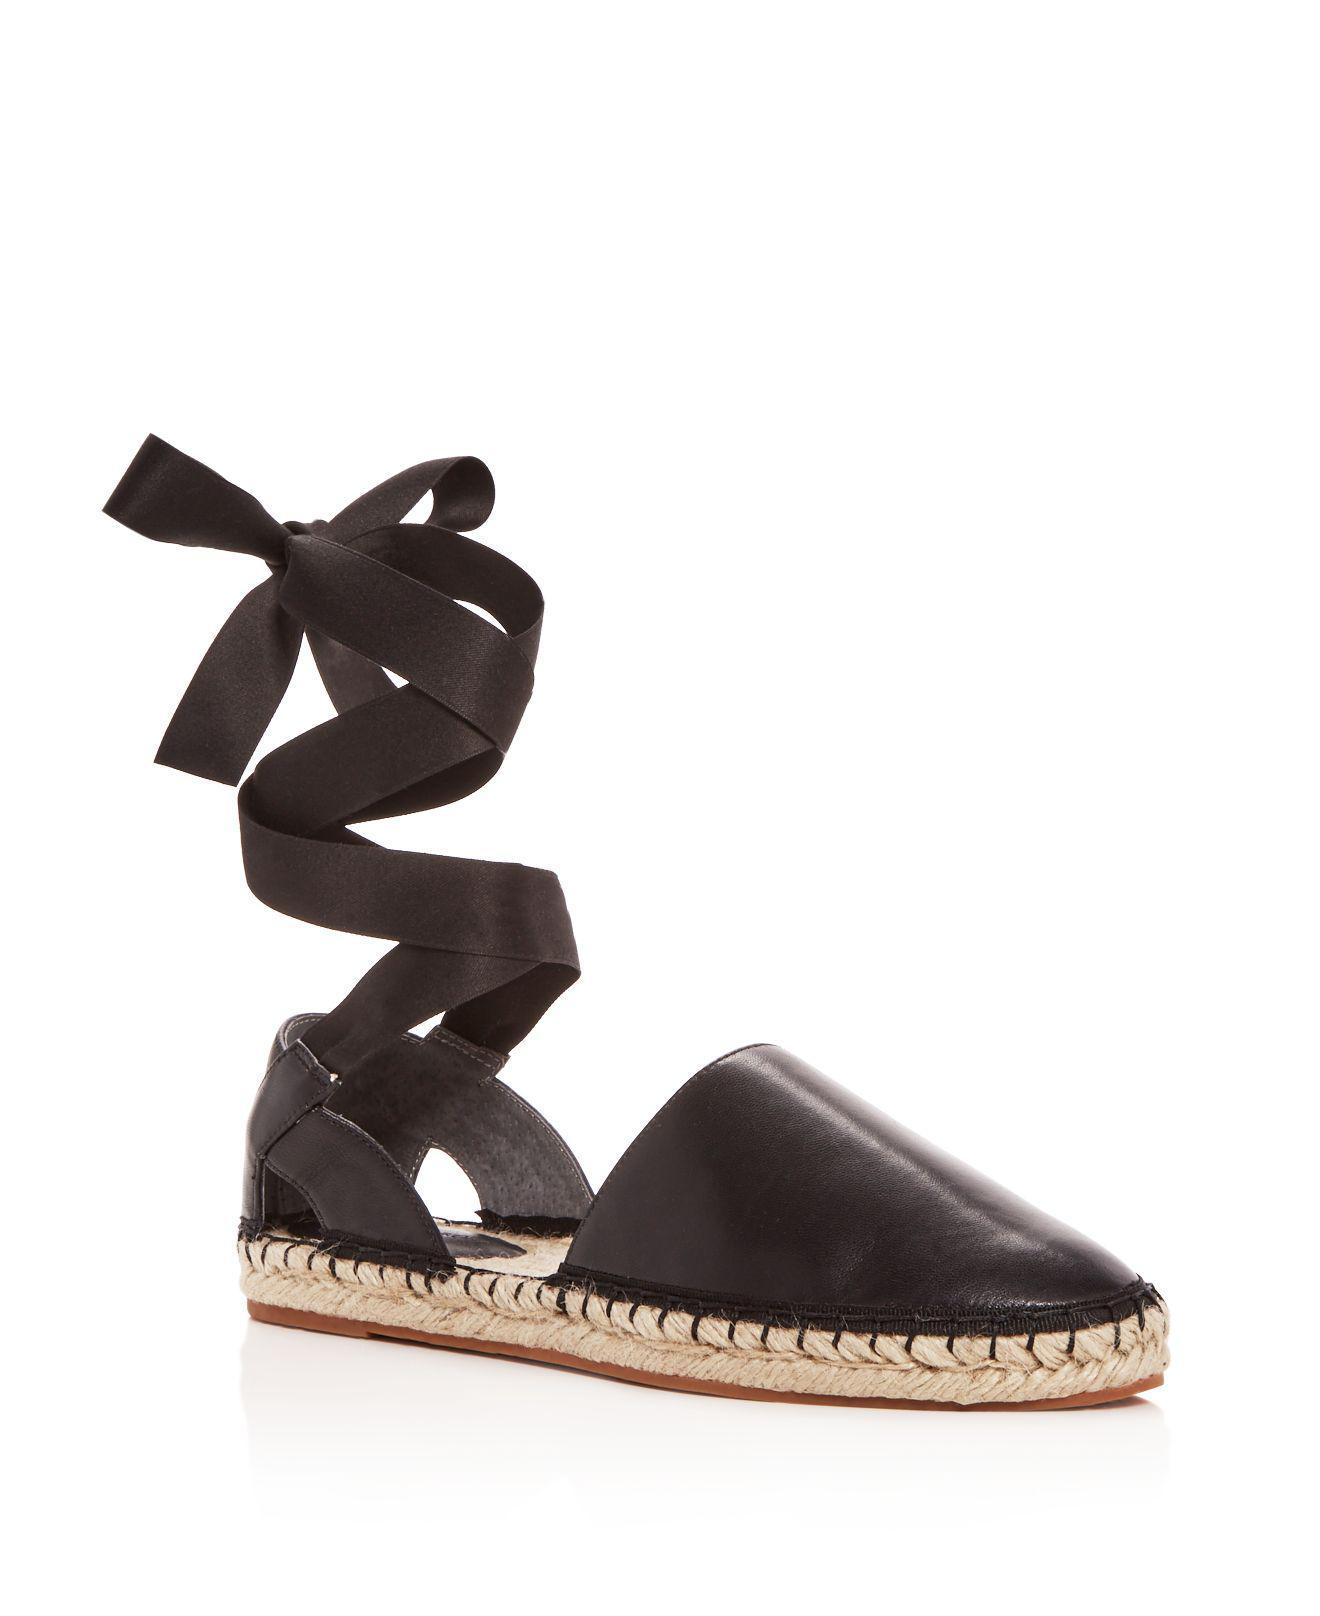 Rebecca Minkoff Women's Vivien Leather Ankle Tie d'Orsay Espadrille Flats ELvS61rn